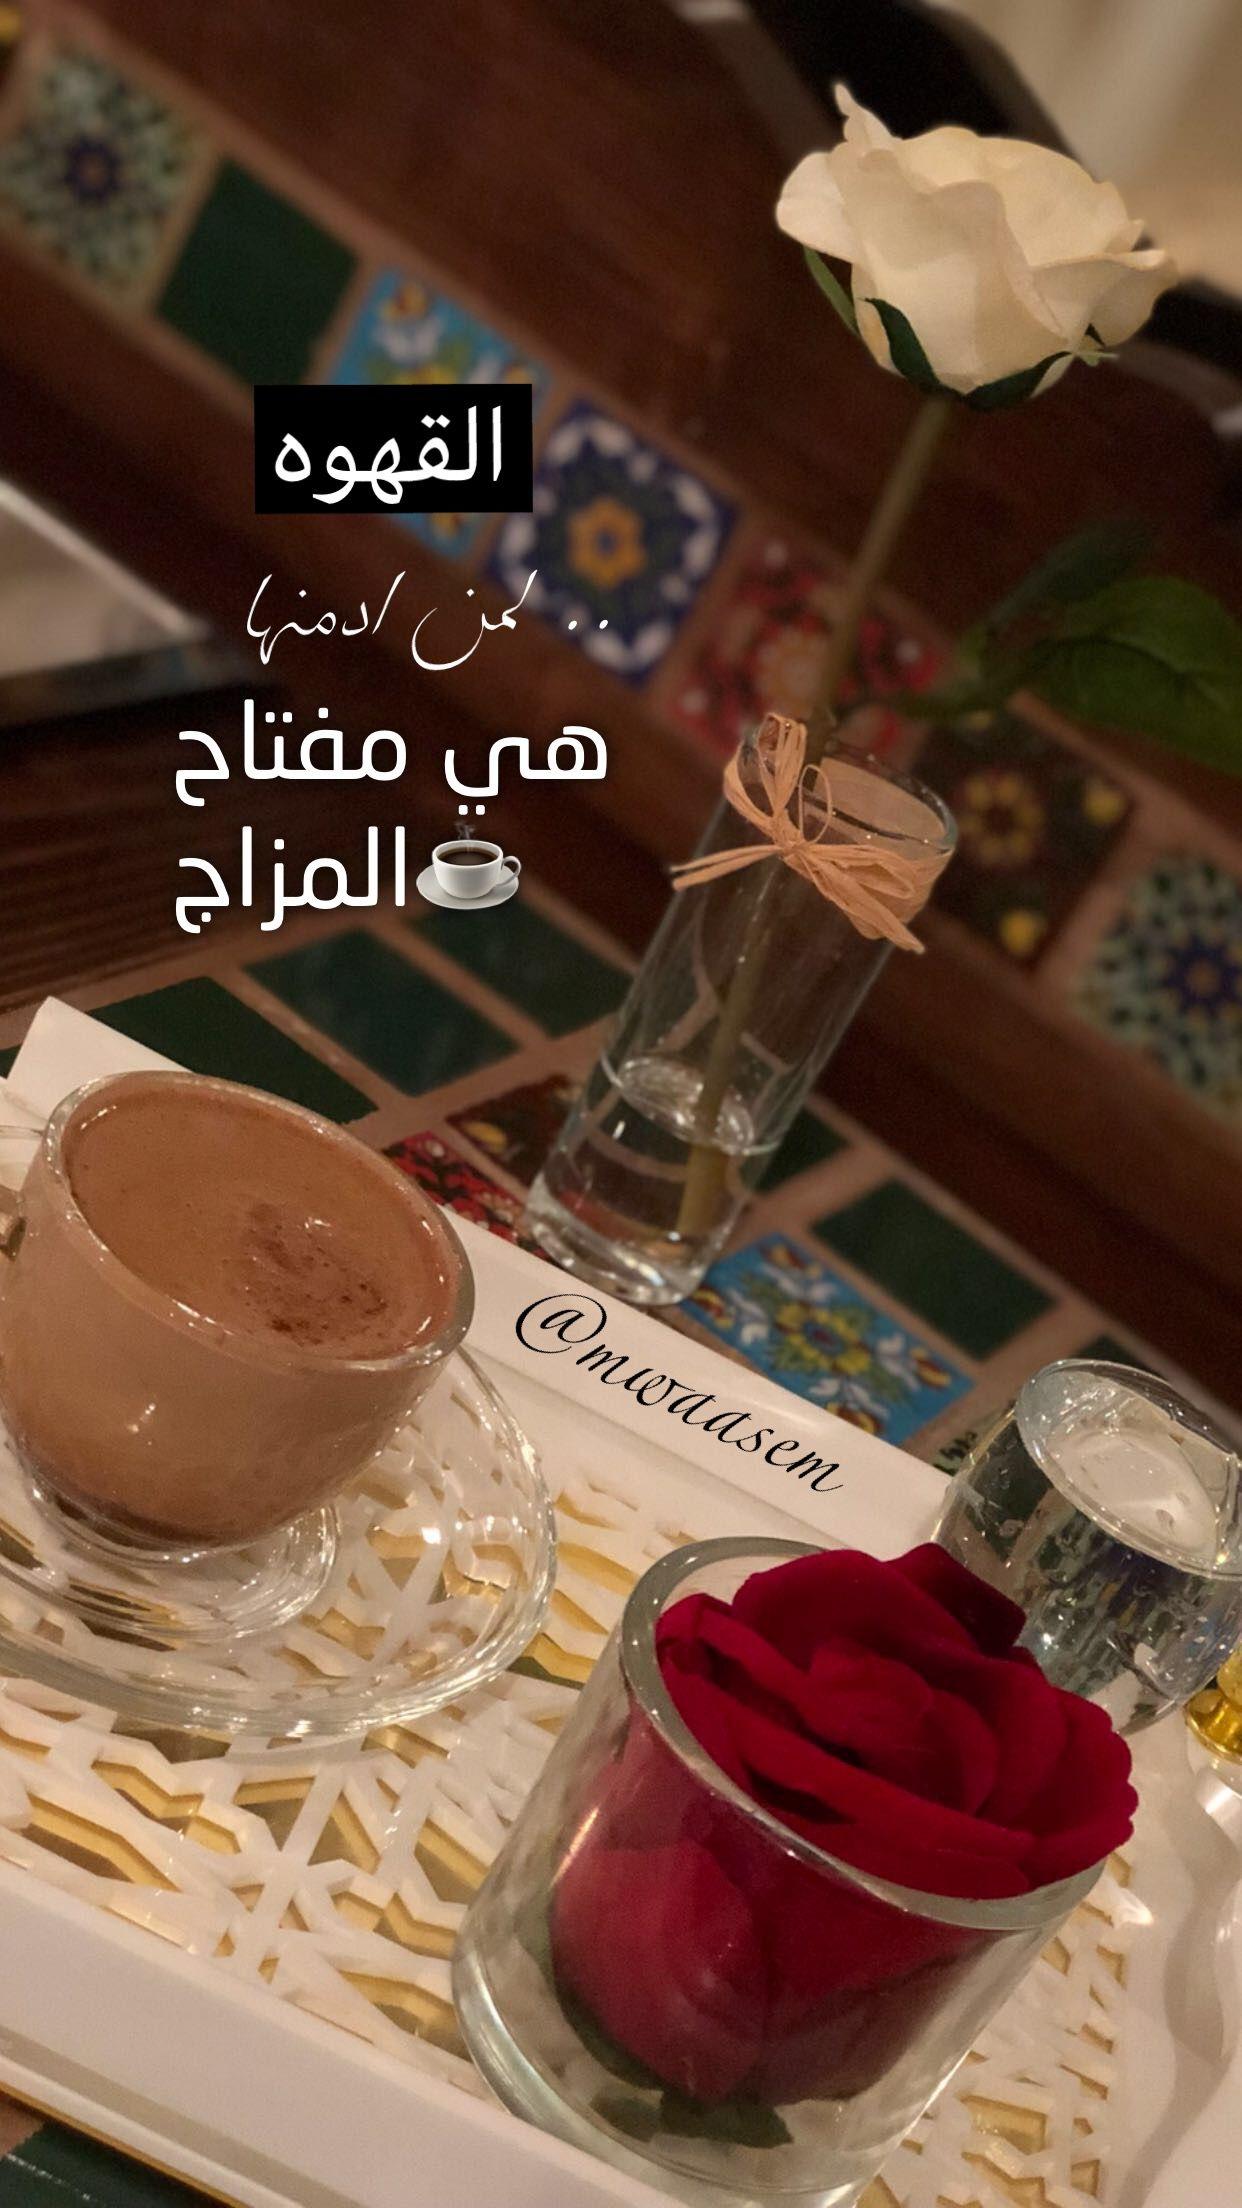 Pin By الجازي الجازي On رمزيات وصور منوعه Pudding Food Desserts